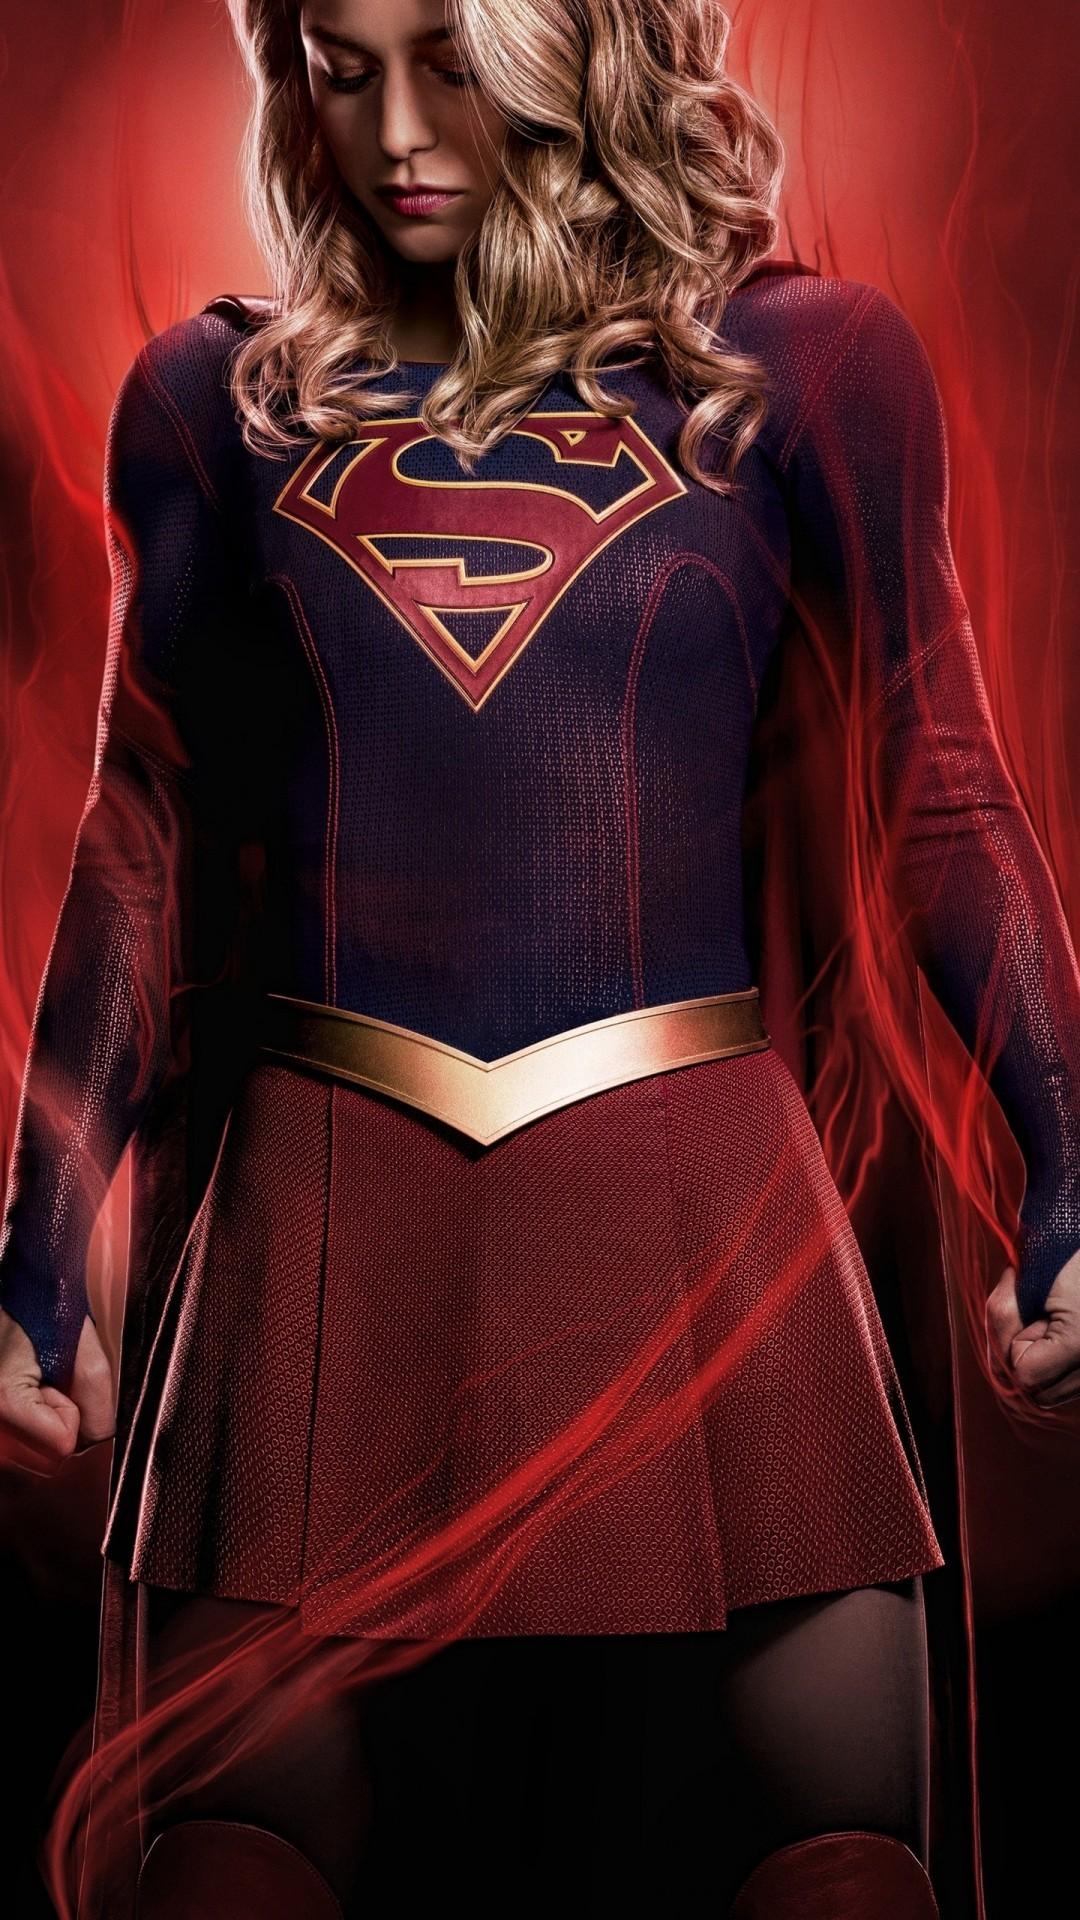 Free Supergirl Season 4 phone wallpaper by livasnap